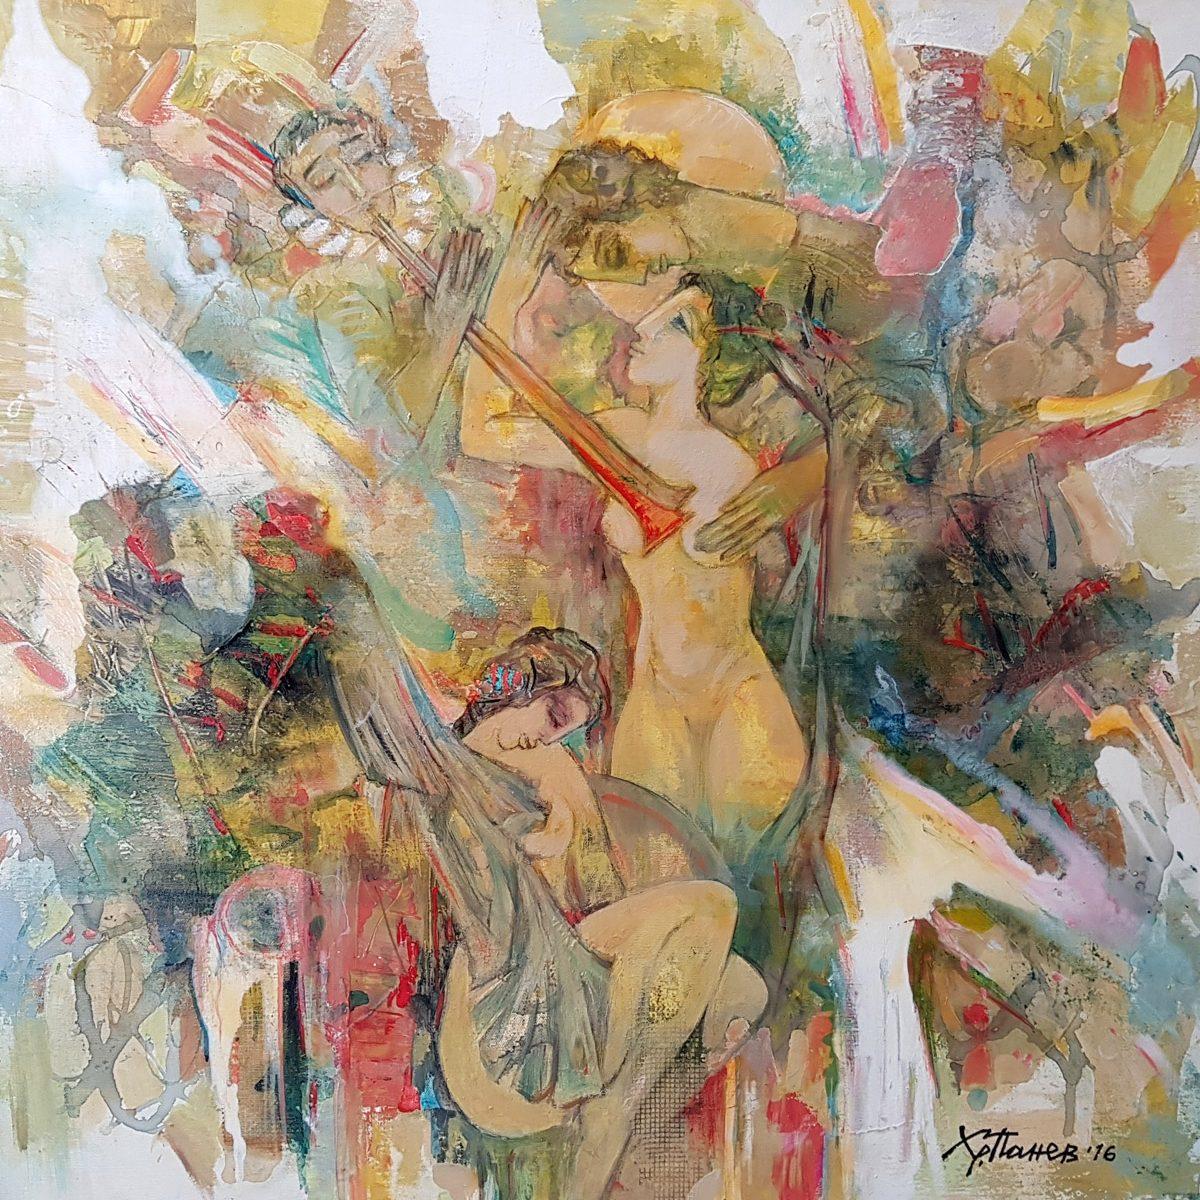 03 Denyat na vlubenite acryloil on canvas 80x80cm